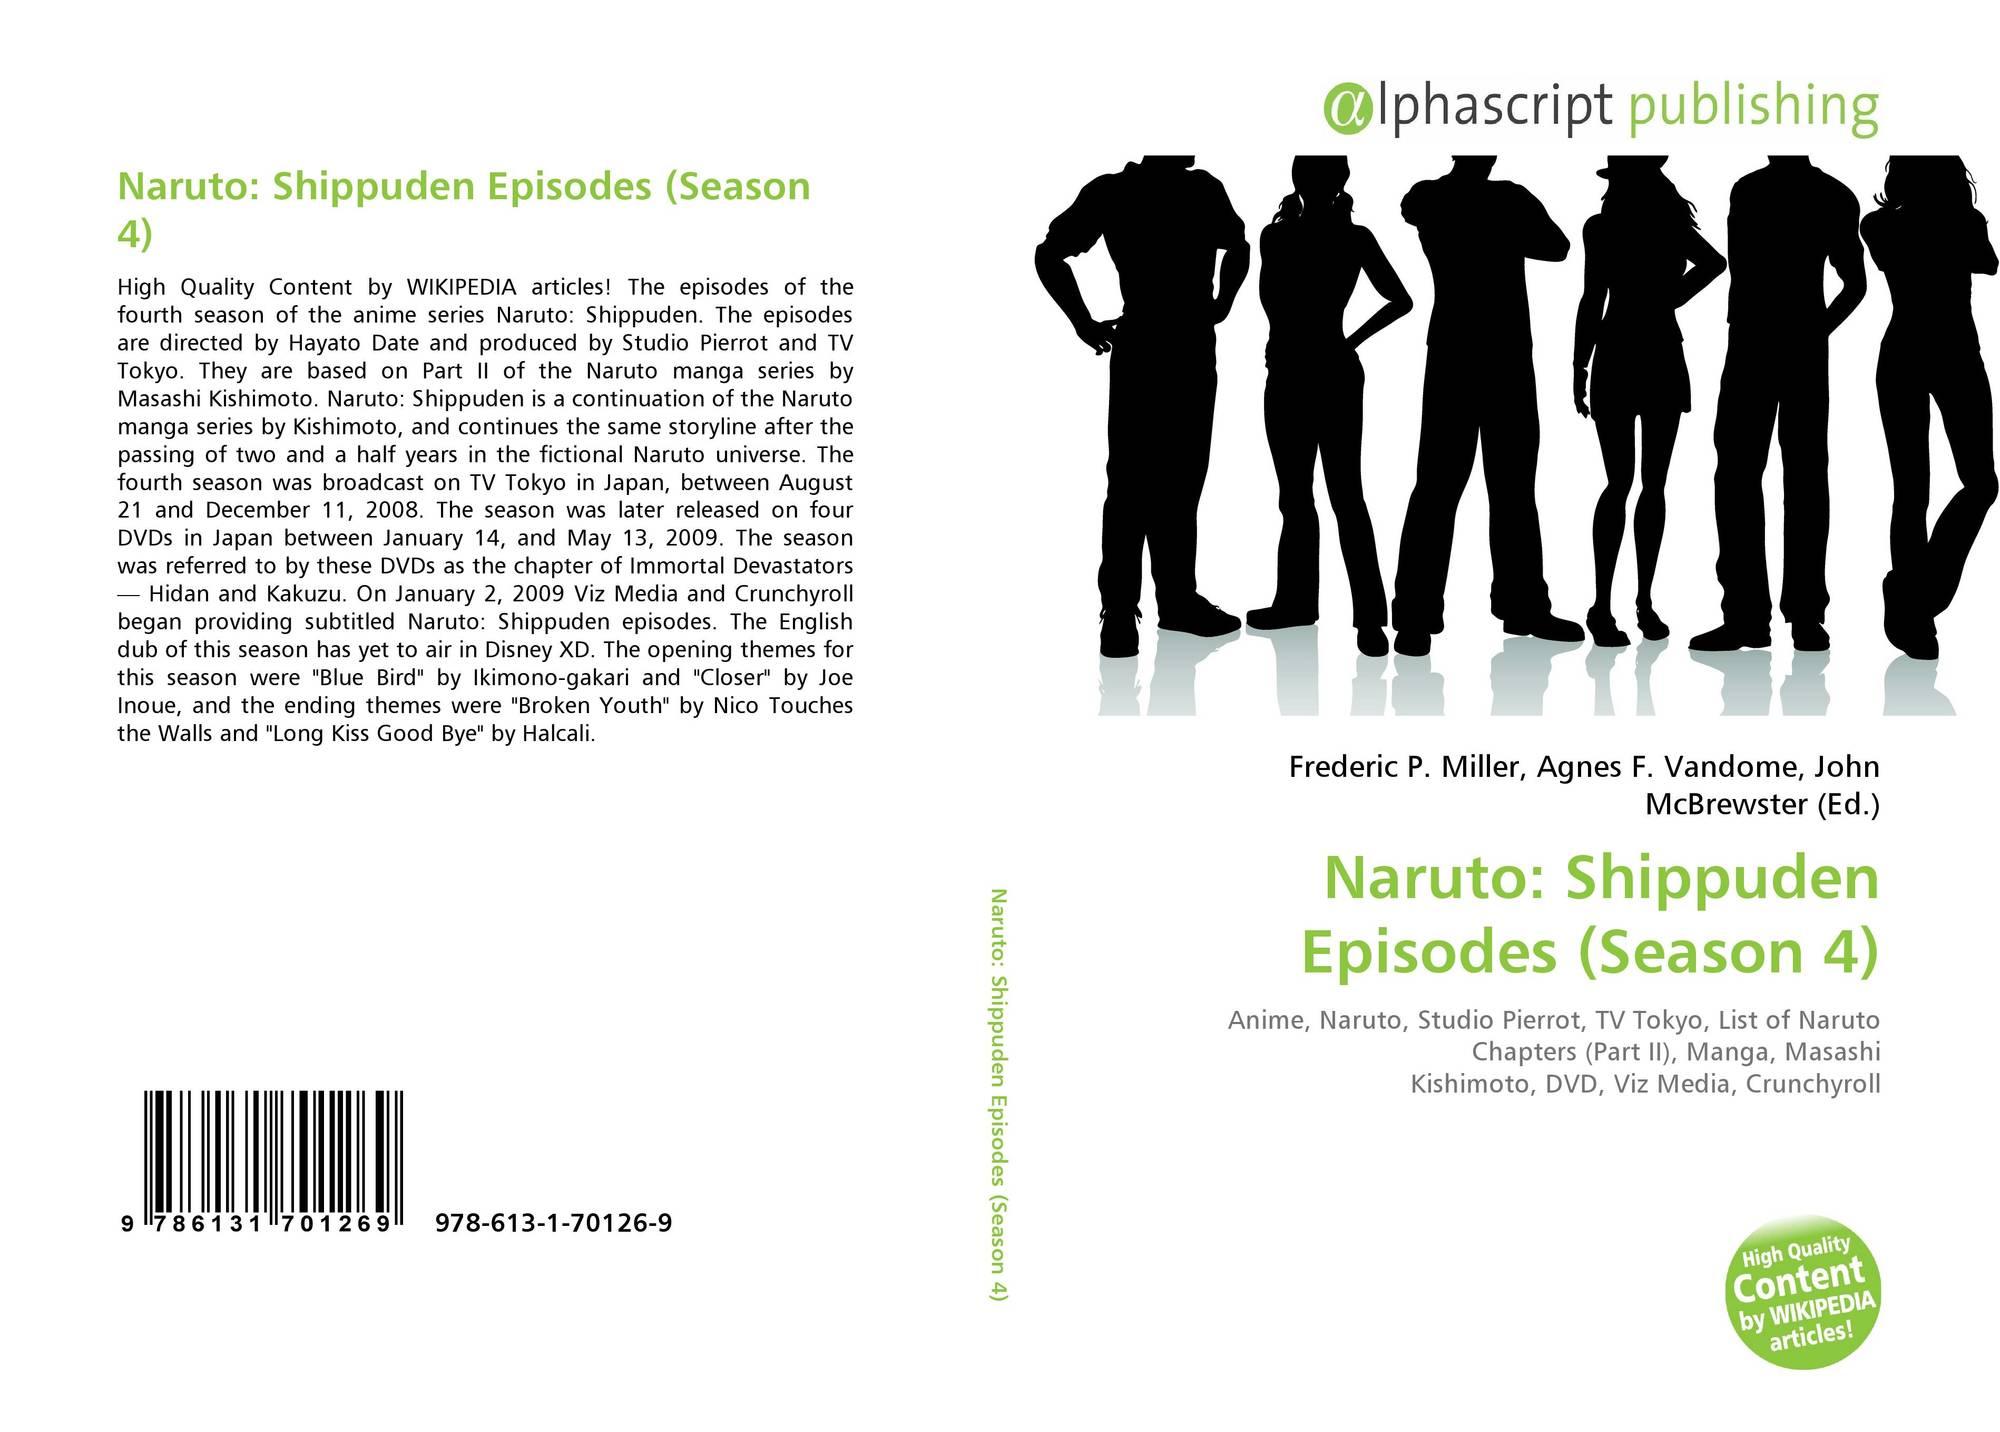 Naruto: Shippuden Episodes (Season 4), 978-613-1-70126-9